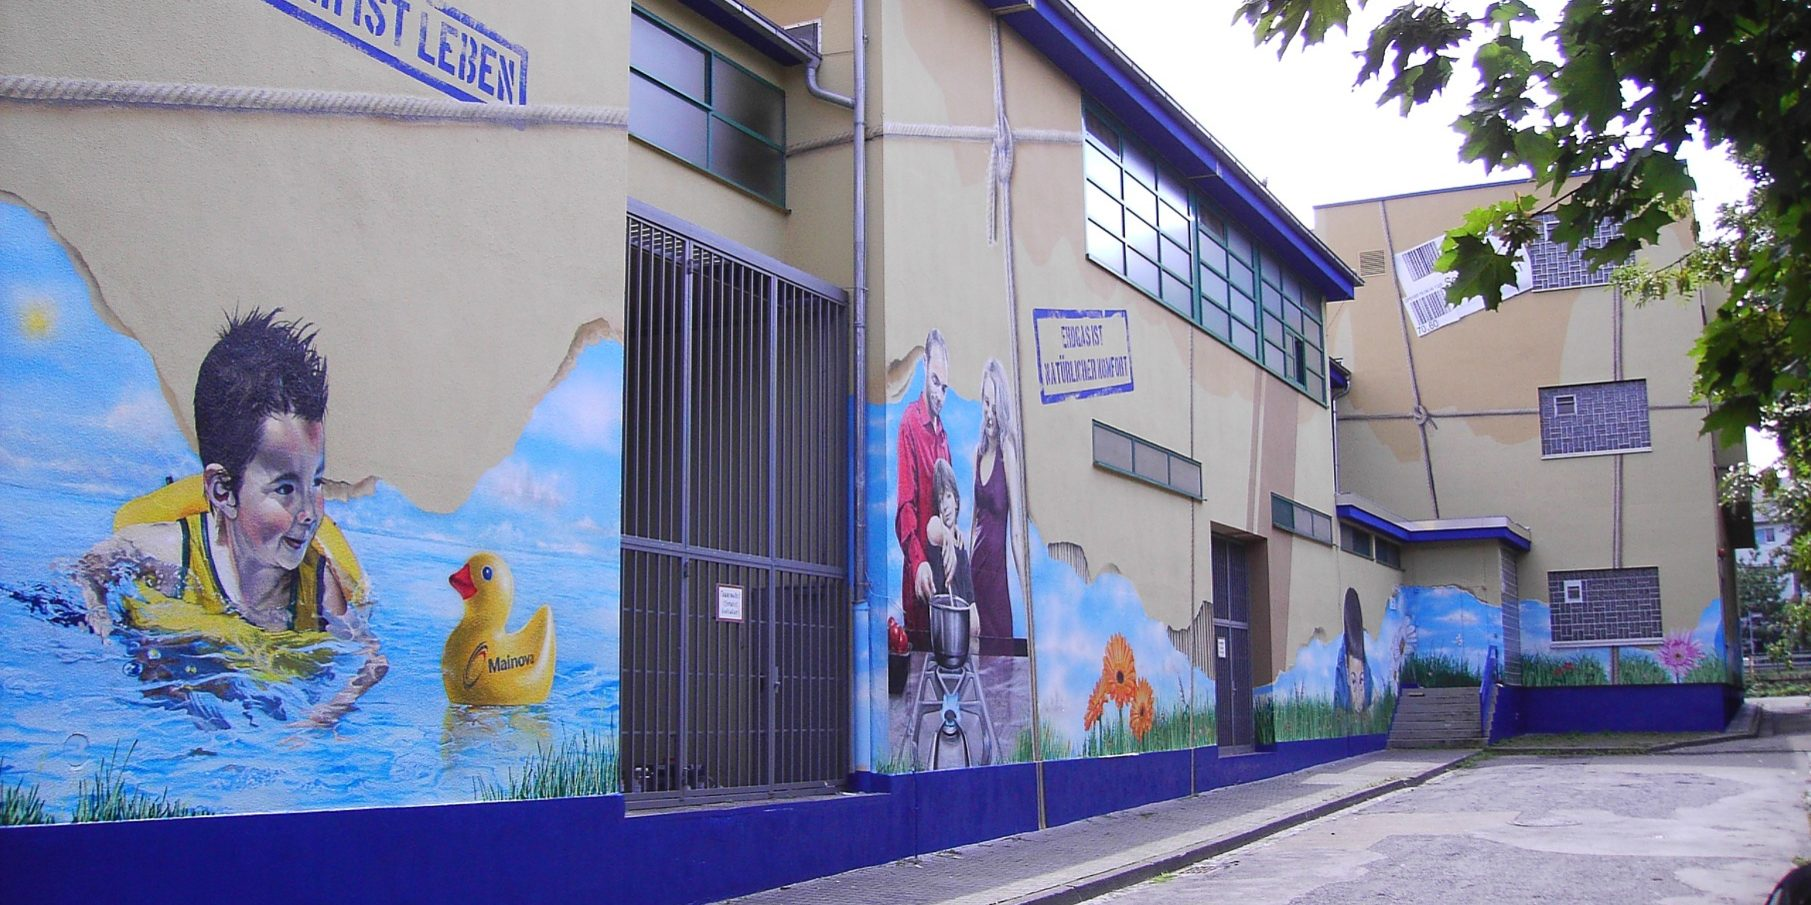 graffitiauftrag-graffitikuenstler-artmos4-mainova-menschen-fotorealistisch-frankfurt